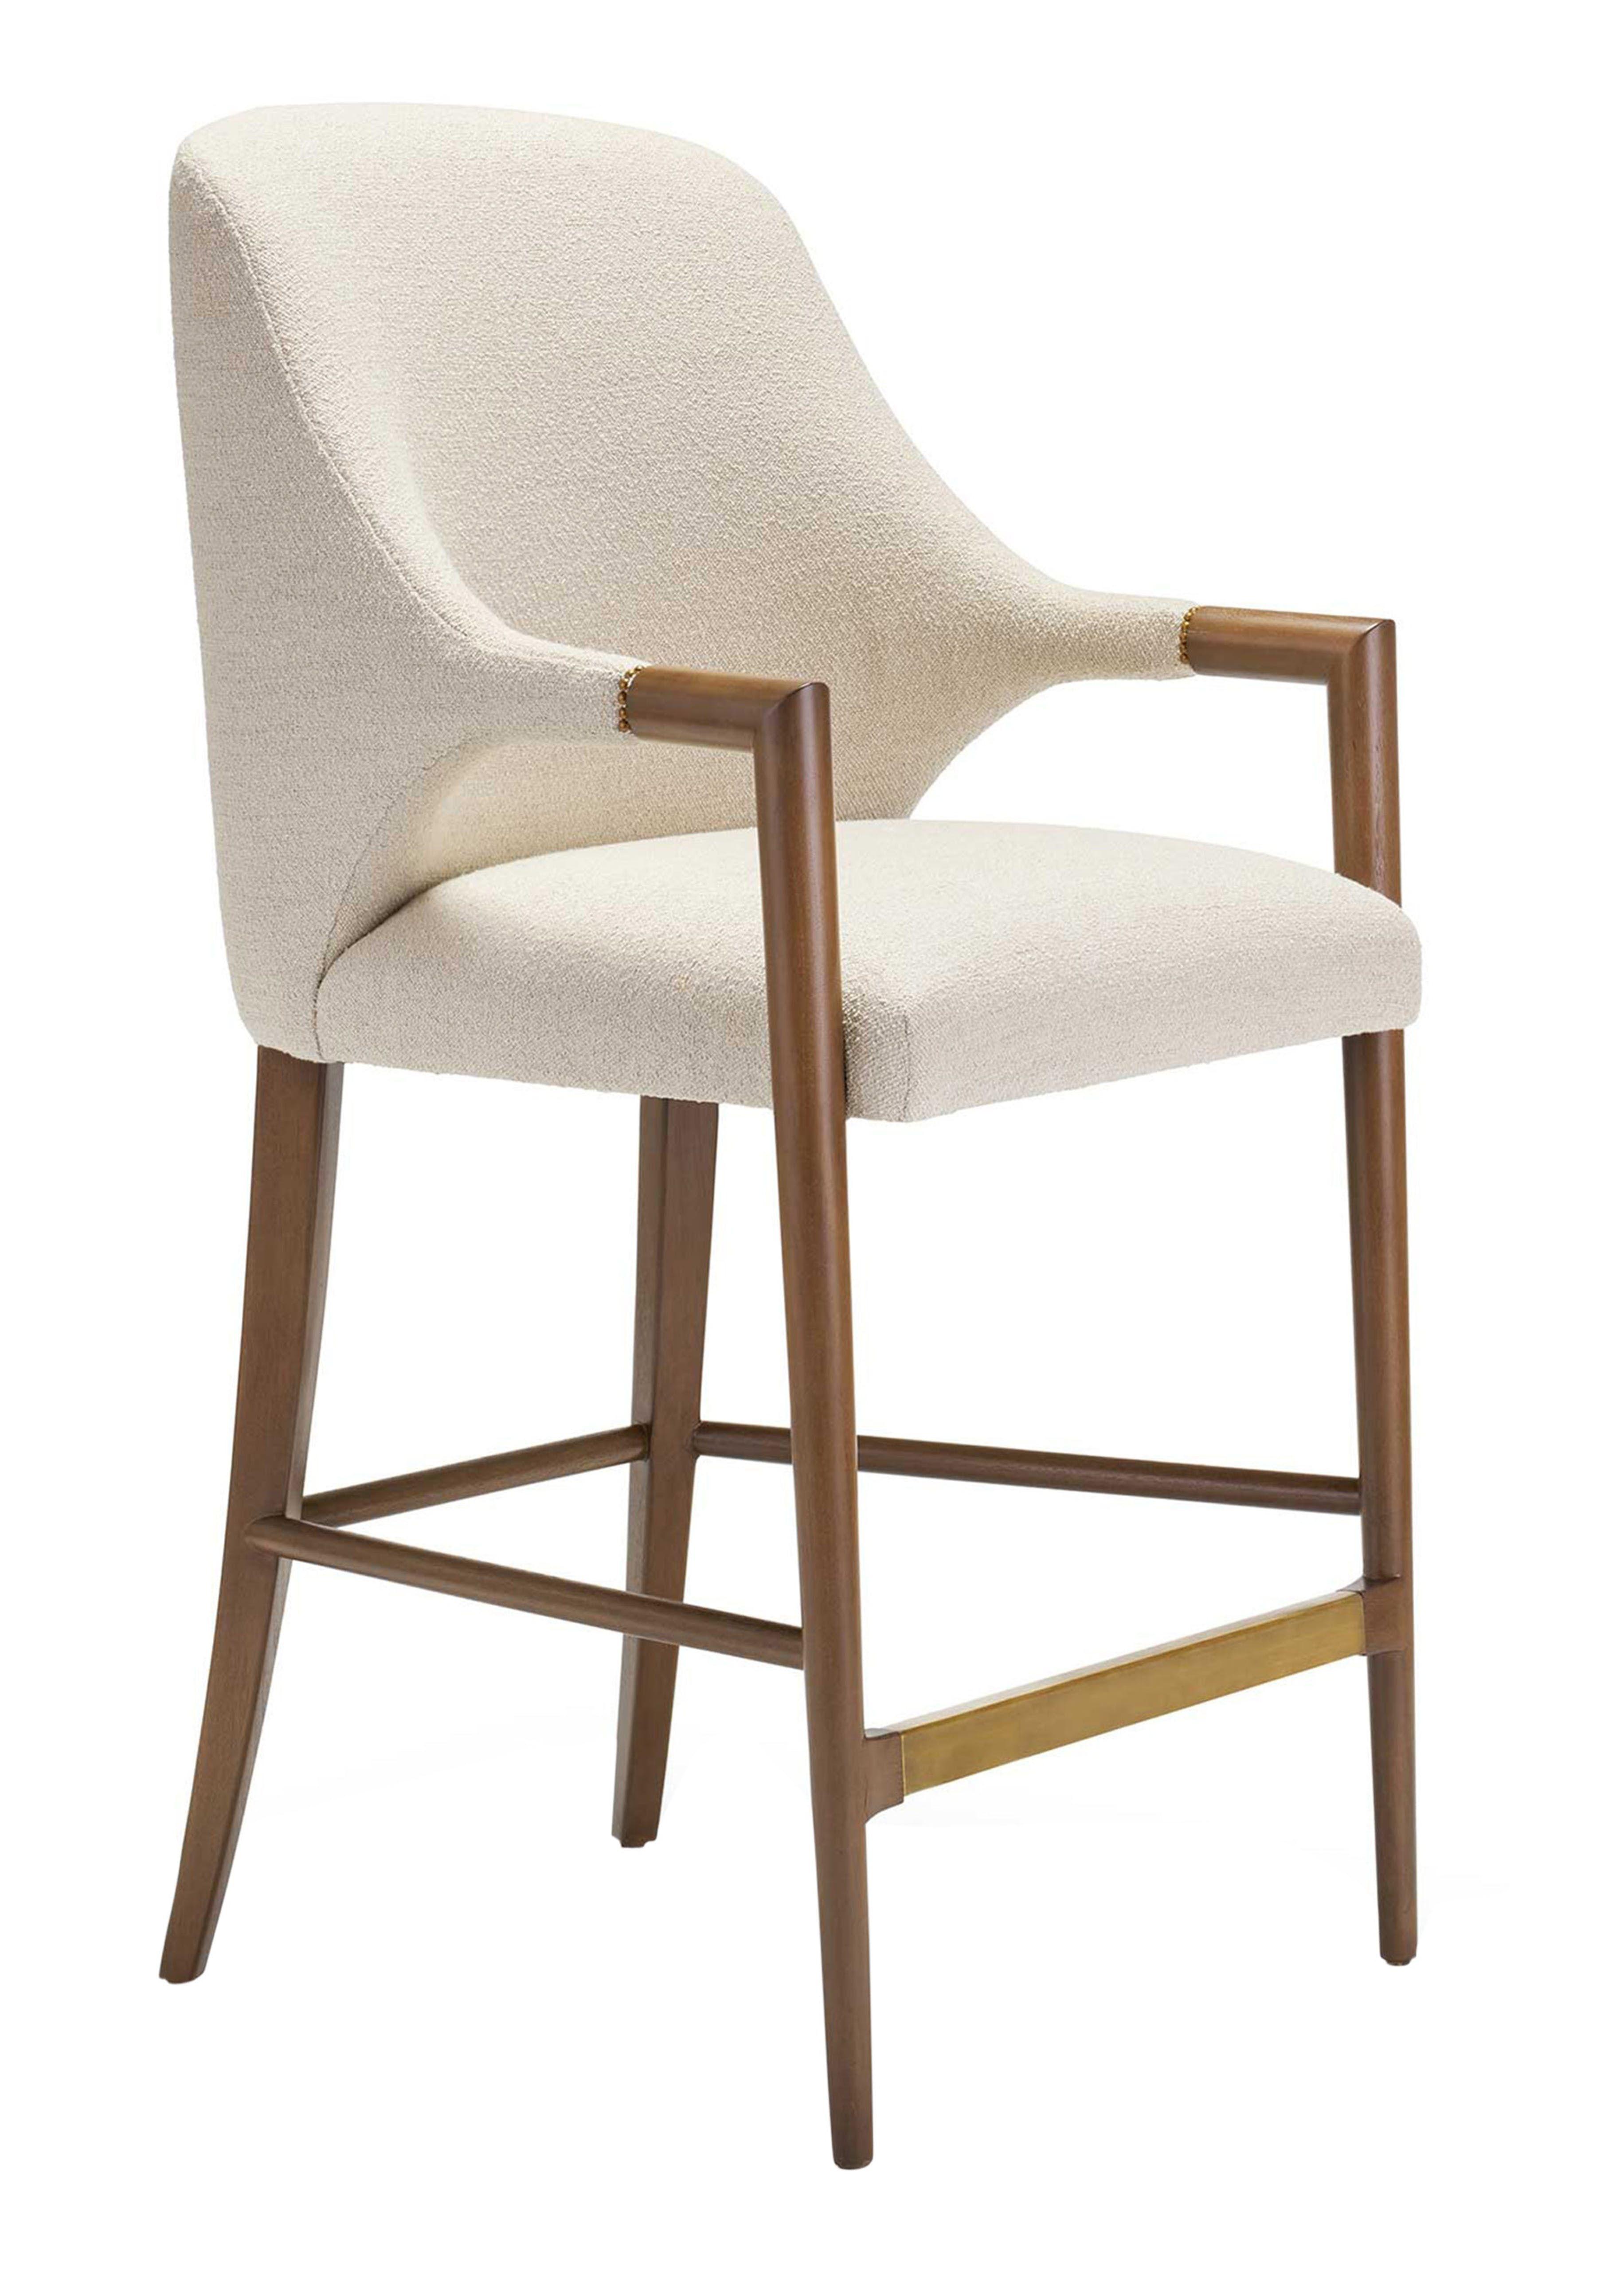 Quintus harris arm barstool furniture furniture seating barstools counter stools upholstery fabric wood 1501645622